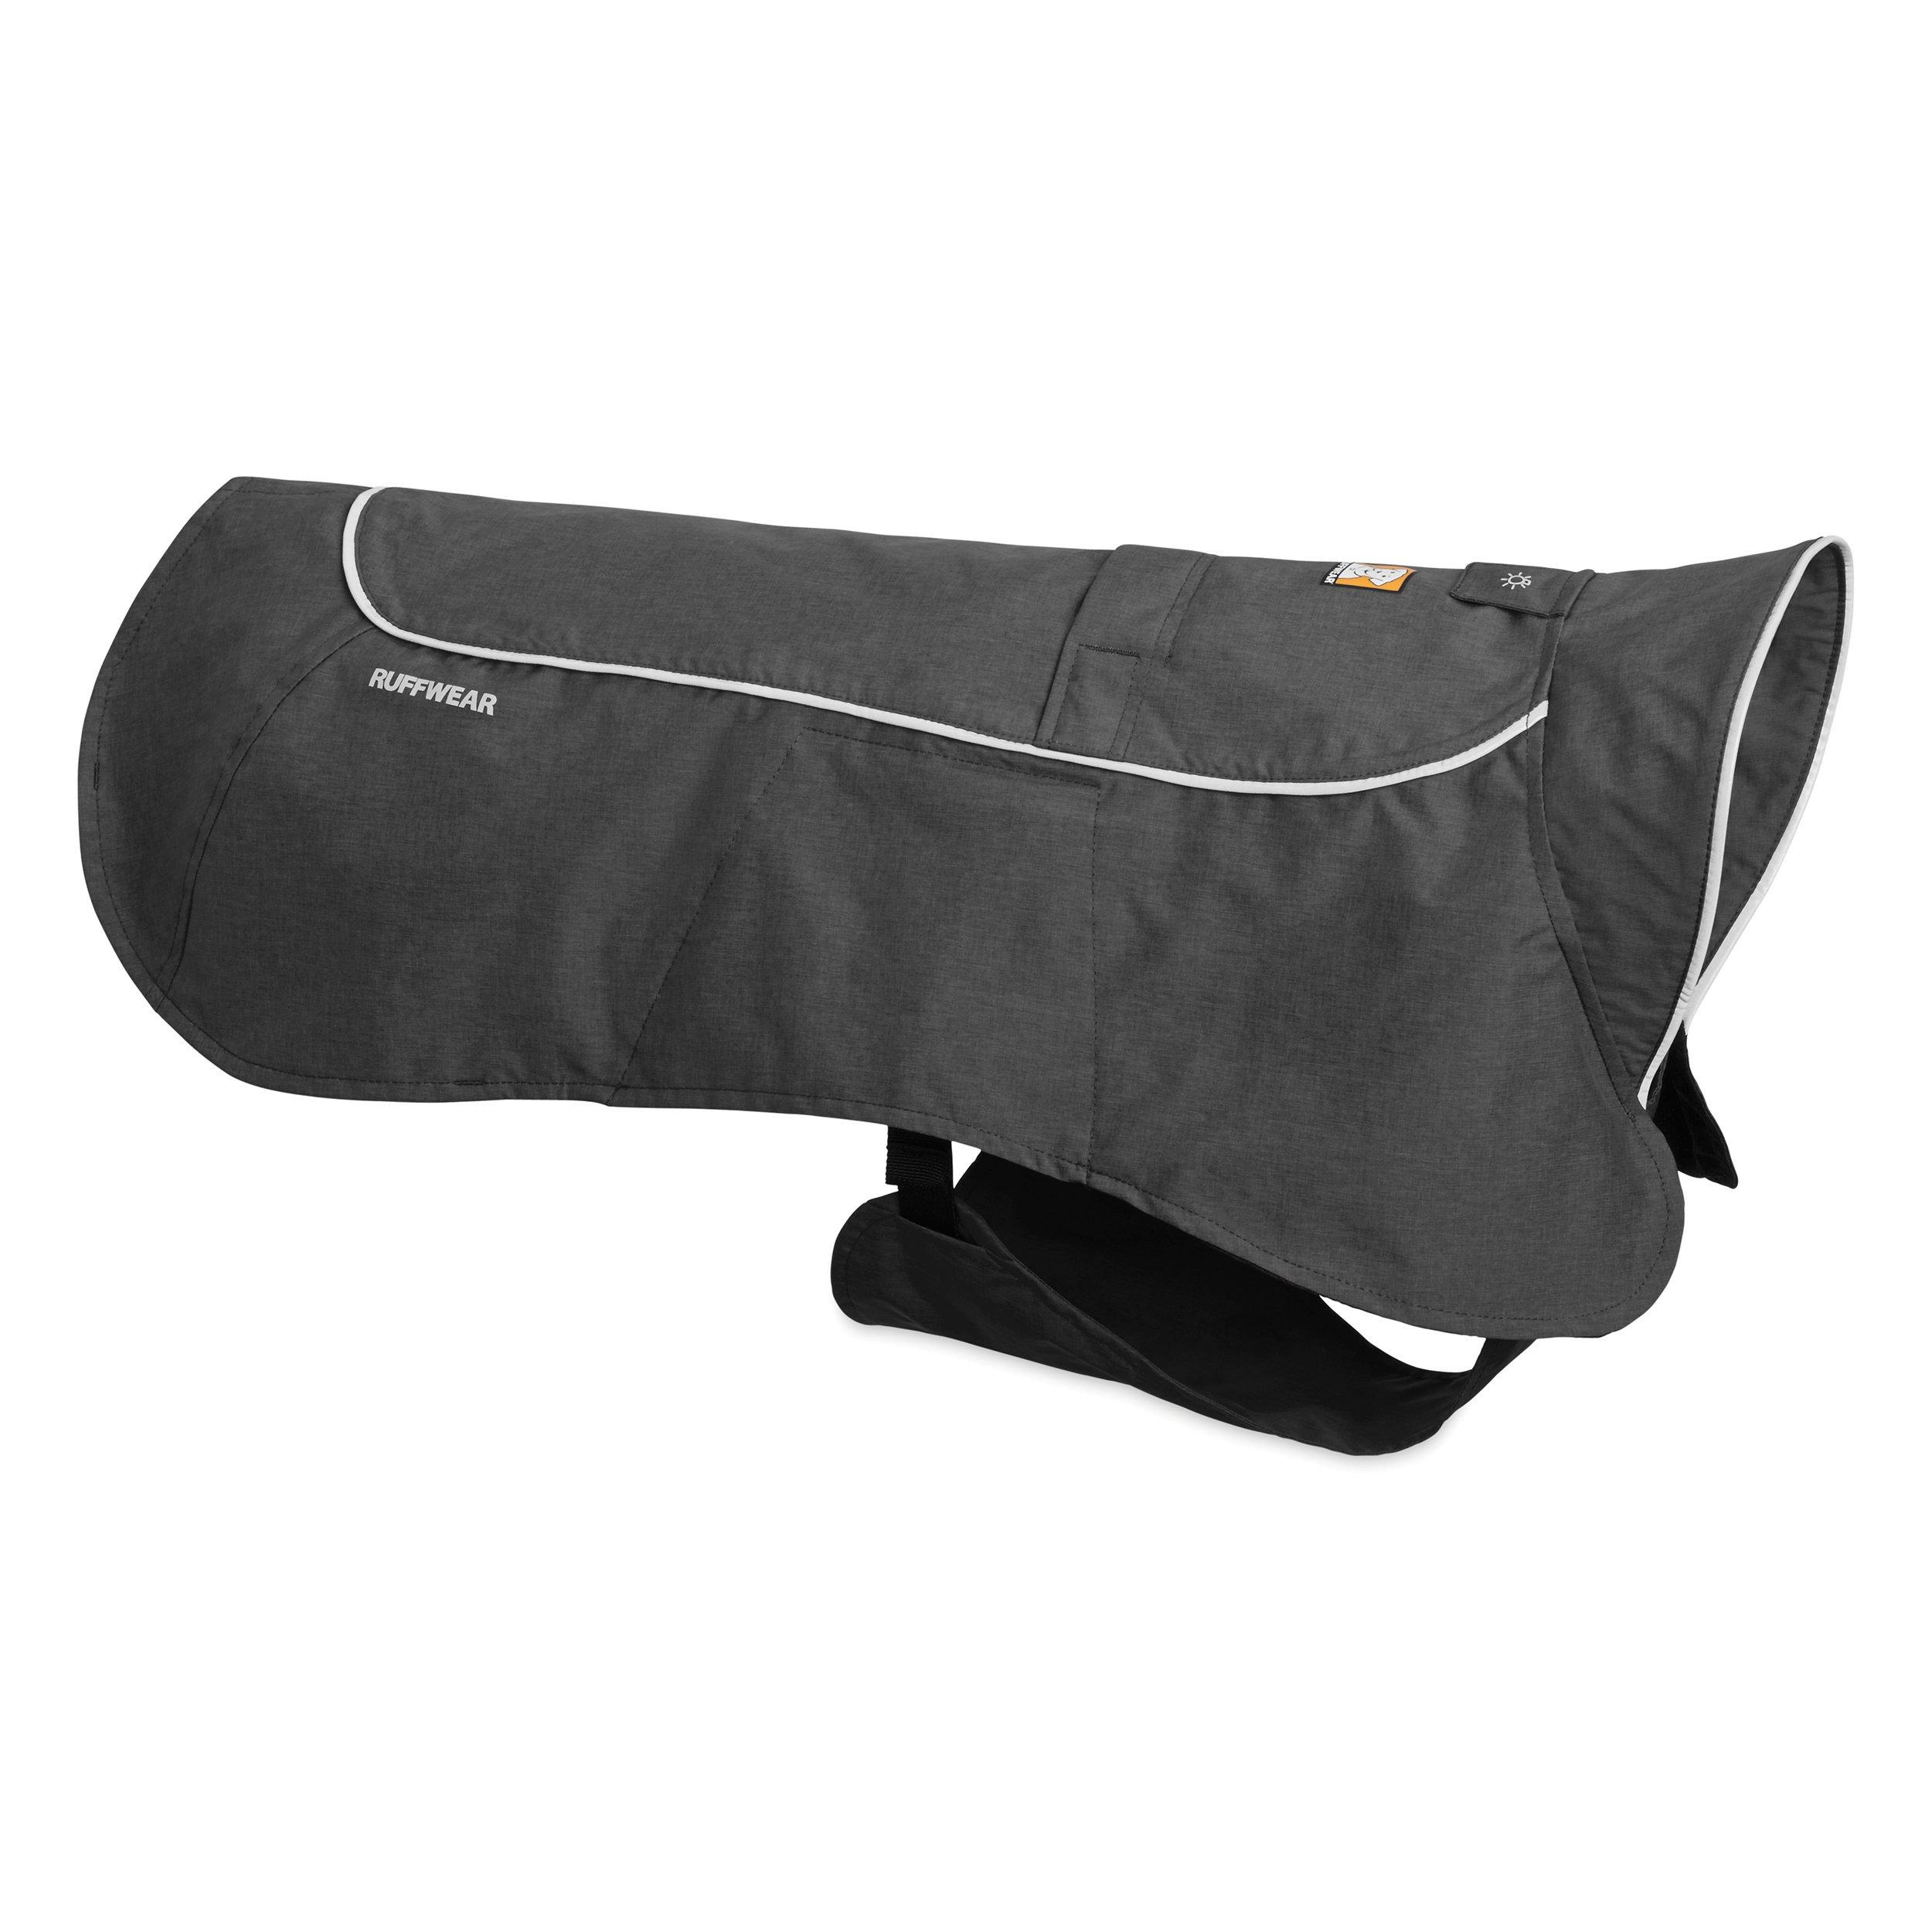 RUFFWEAR - Aira Full Coverage, Waterproof, Breathable Rain Jacket for Dogs, Twilight Gray, Large by RUFFWEAR